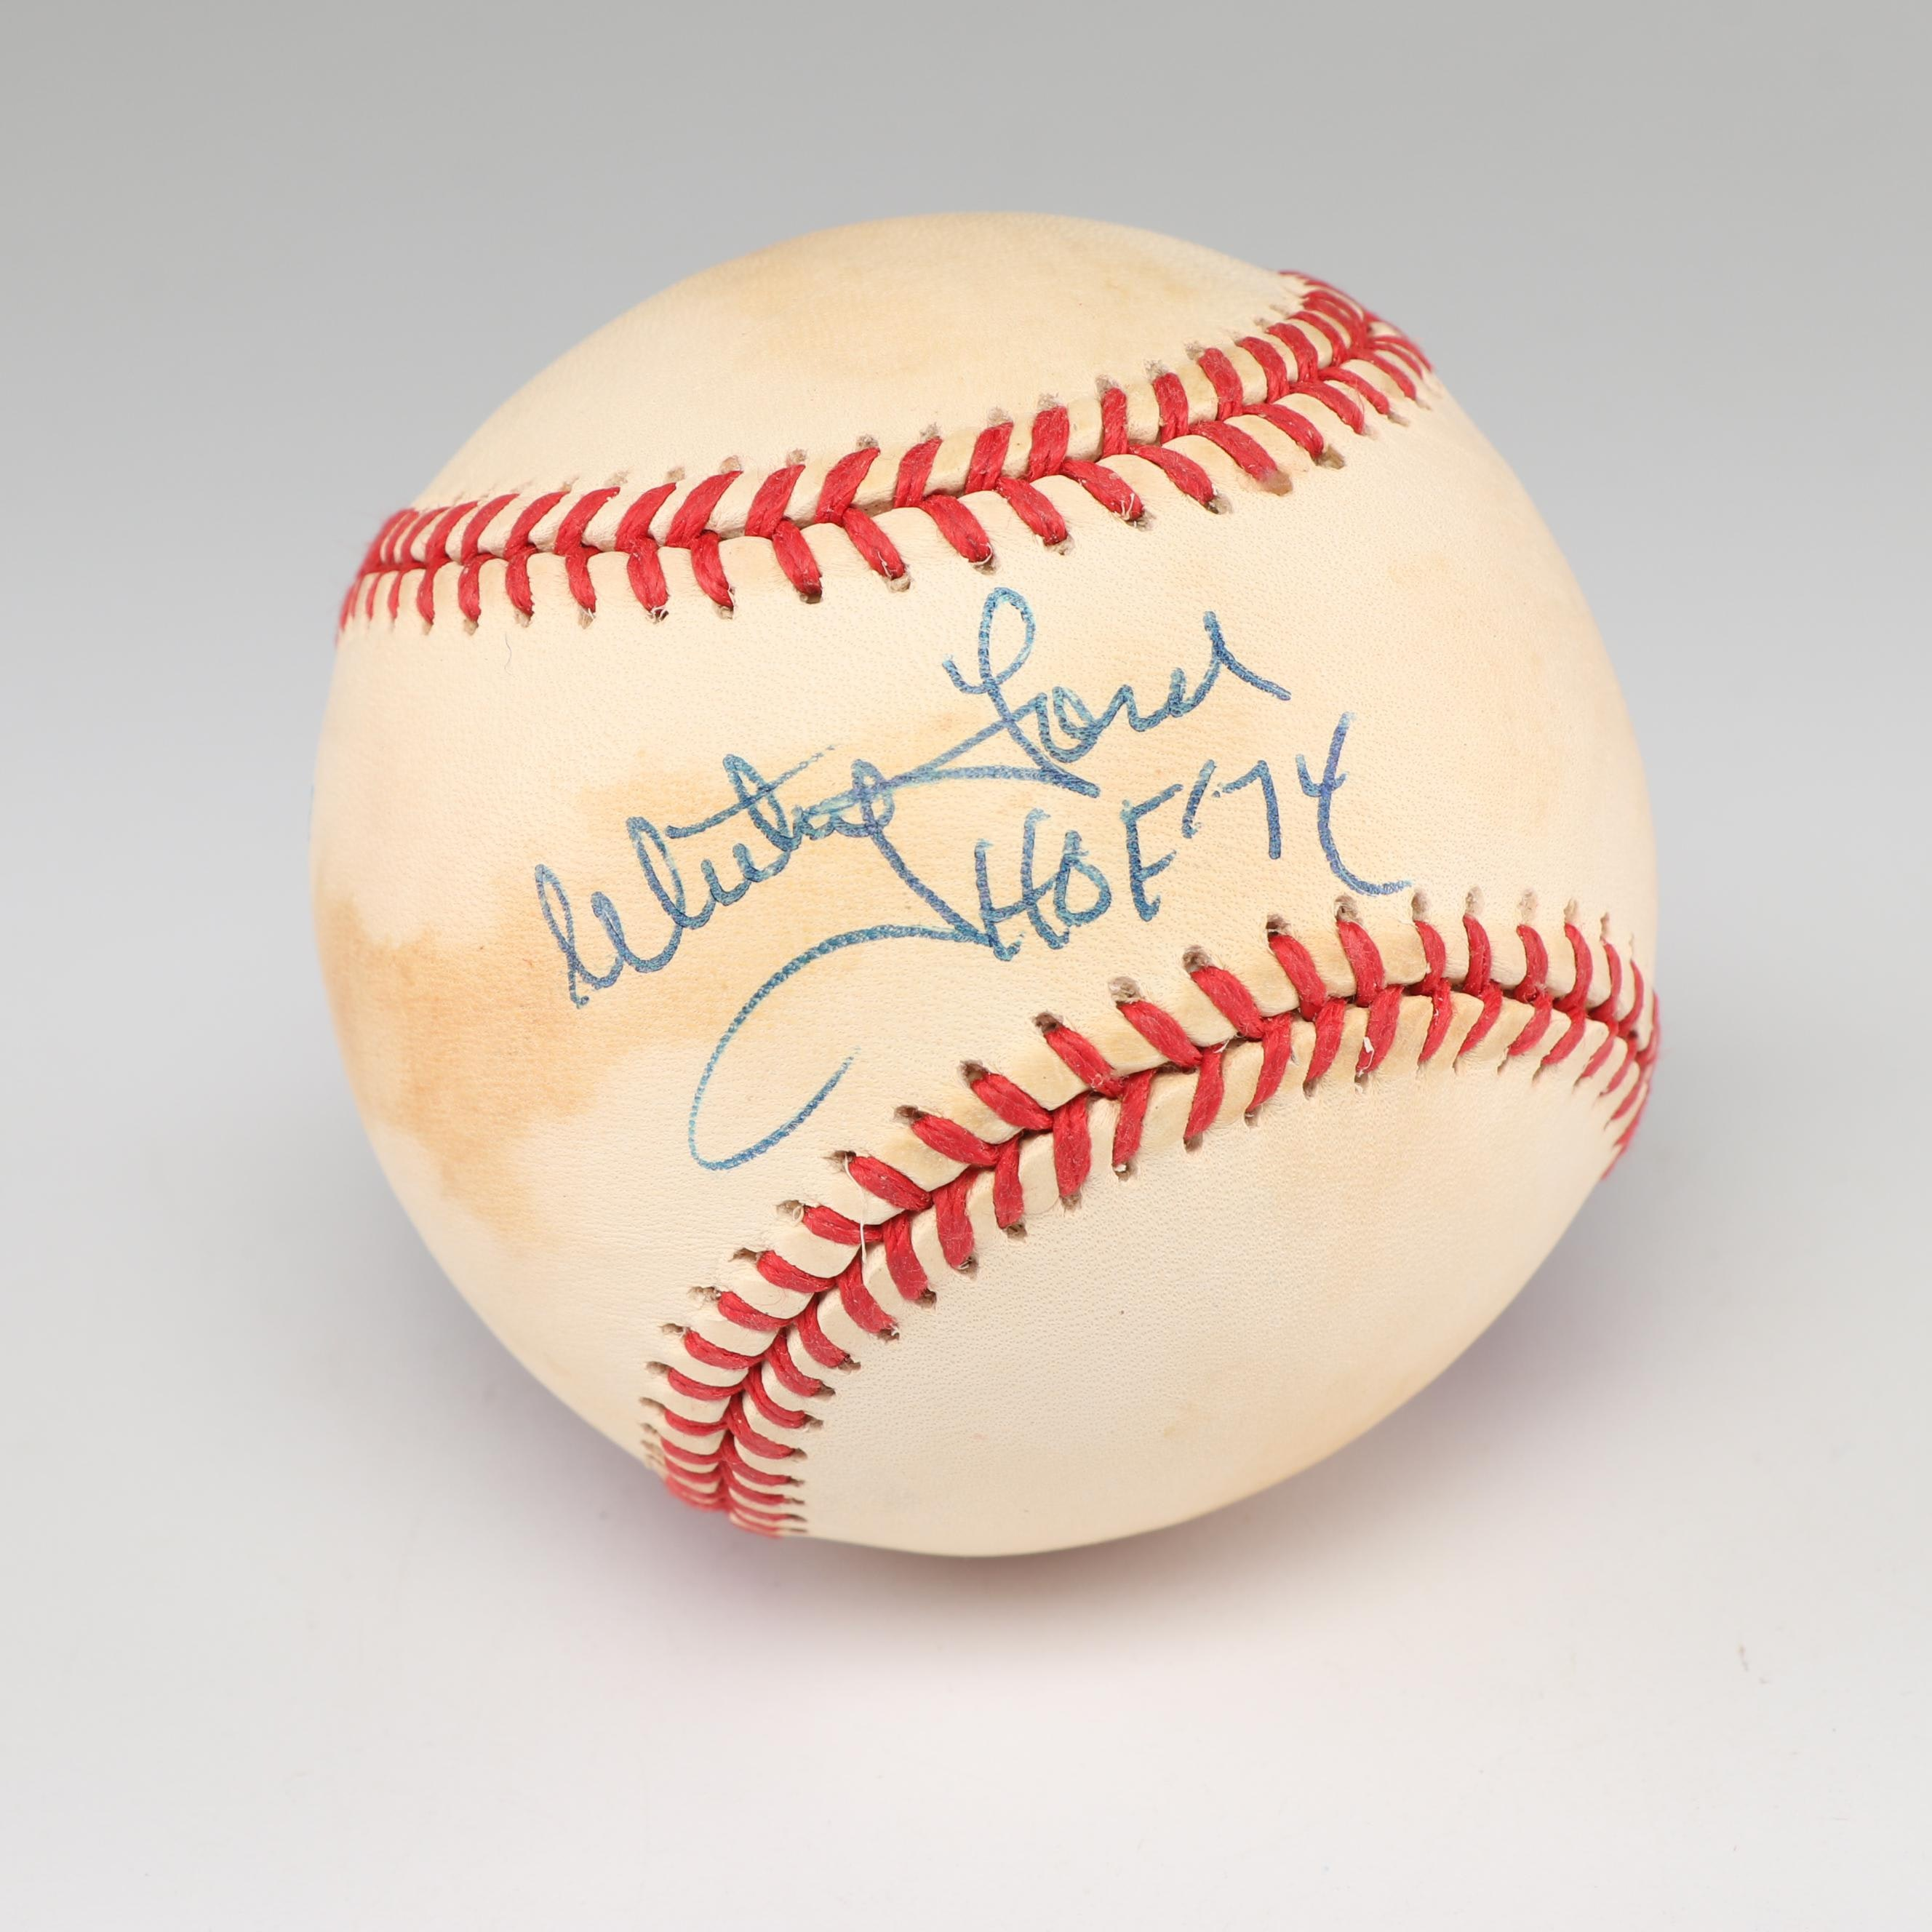 Whitey Ford Autographed Baseball